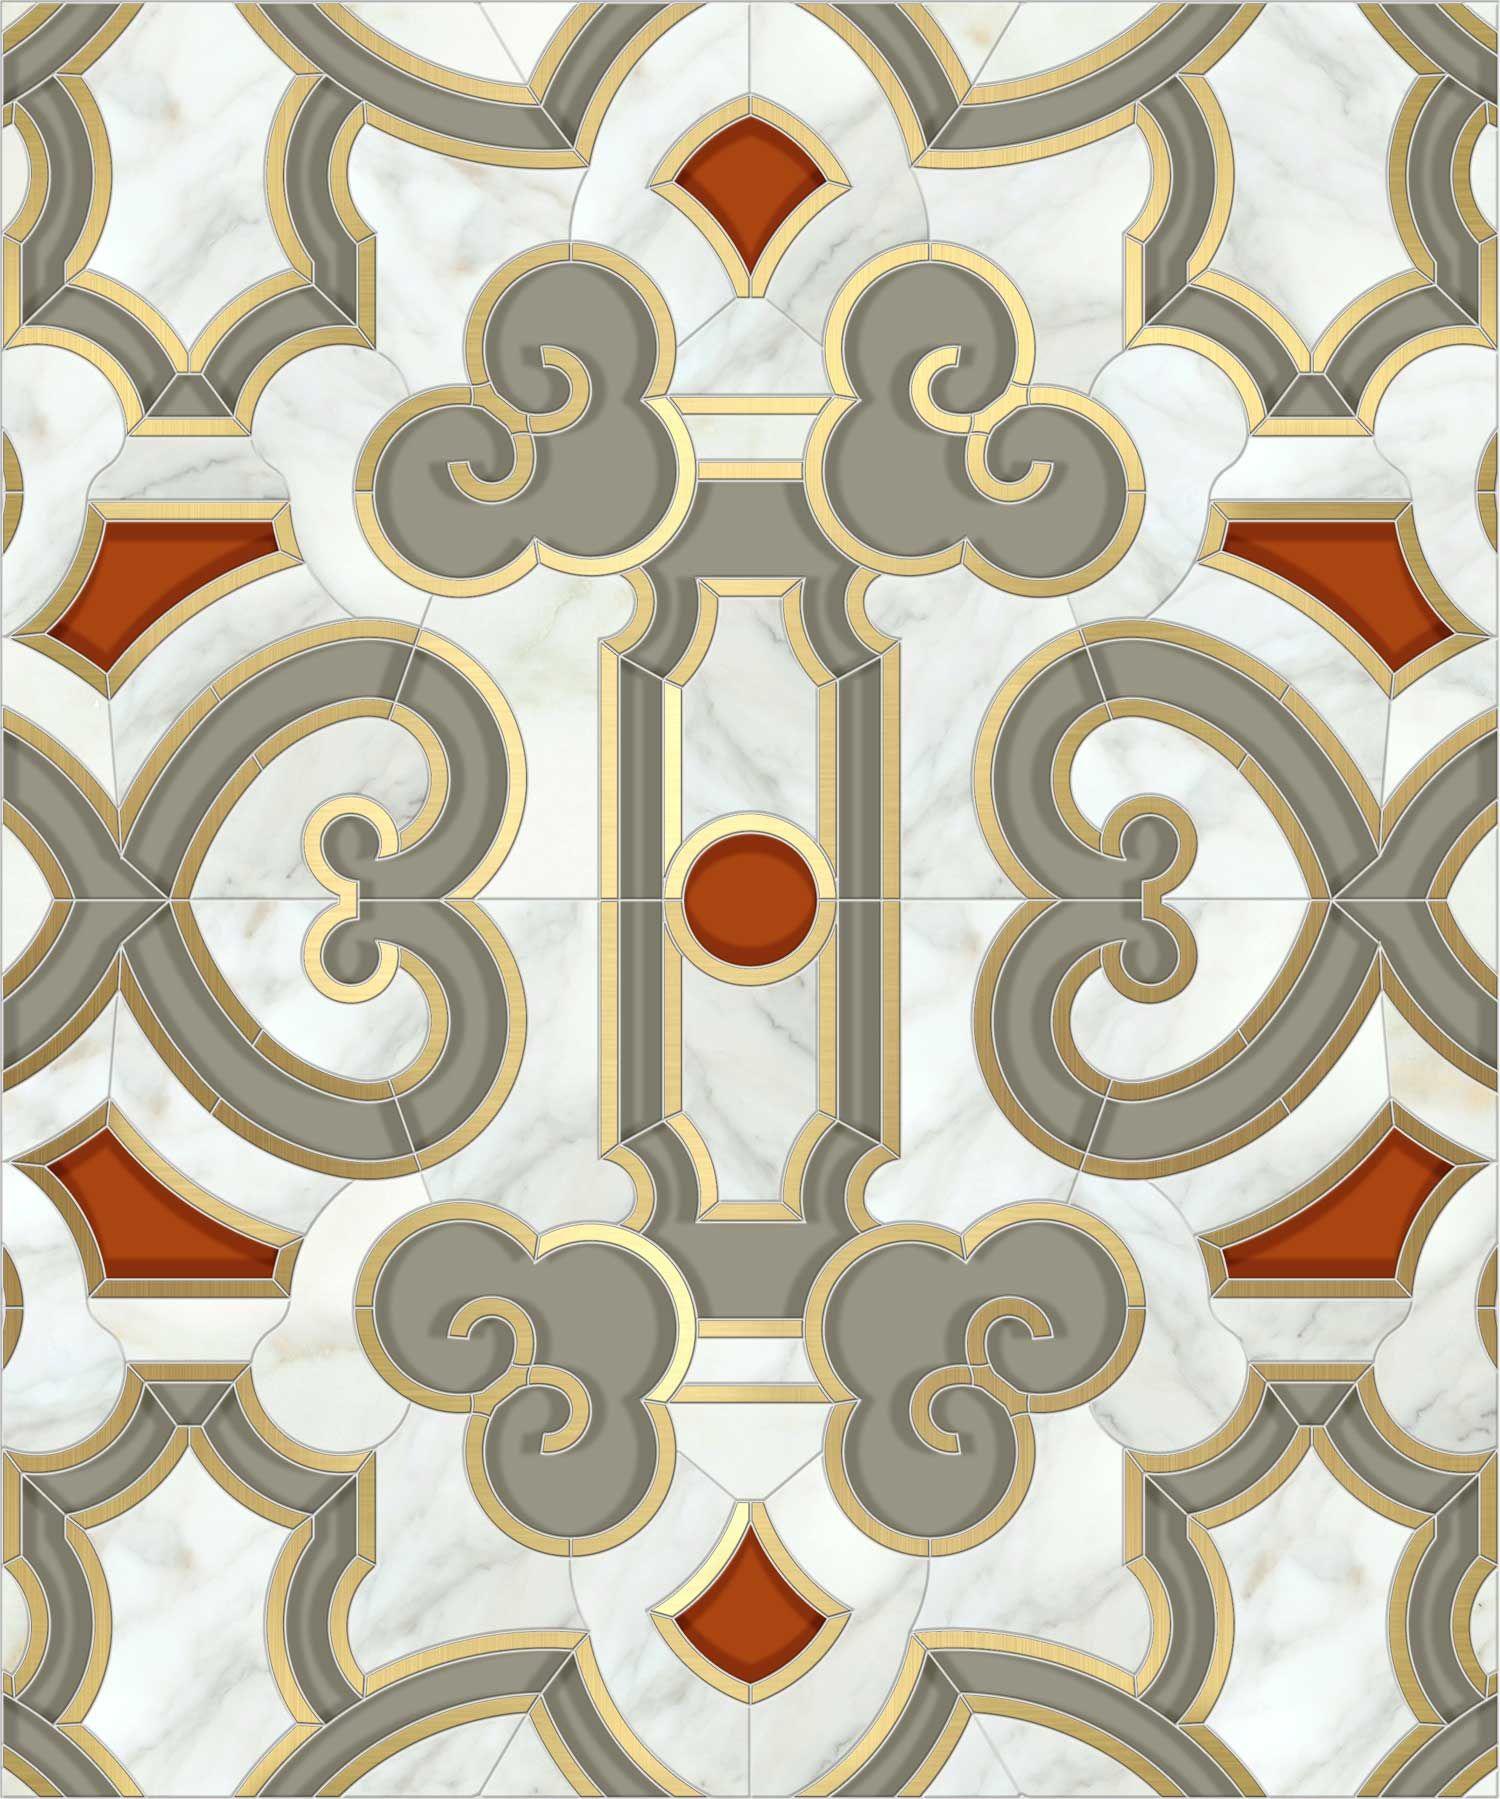 Odyssée Mosaics Collection by Mosaique Surface | Плитка ...